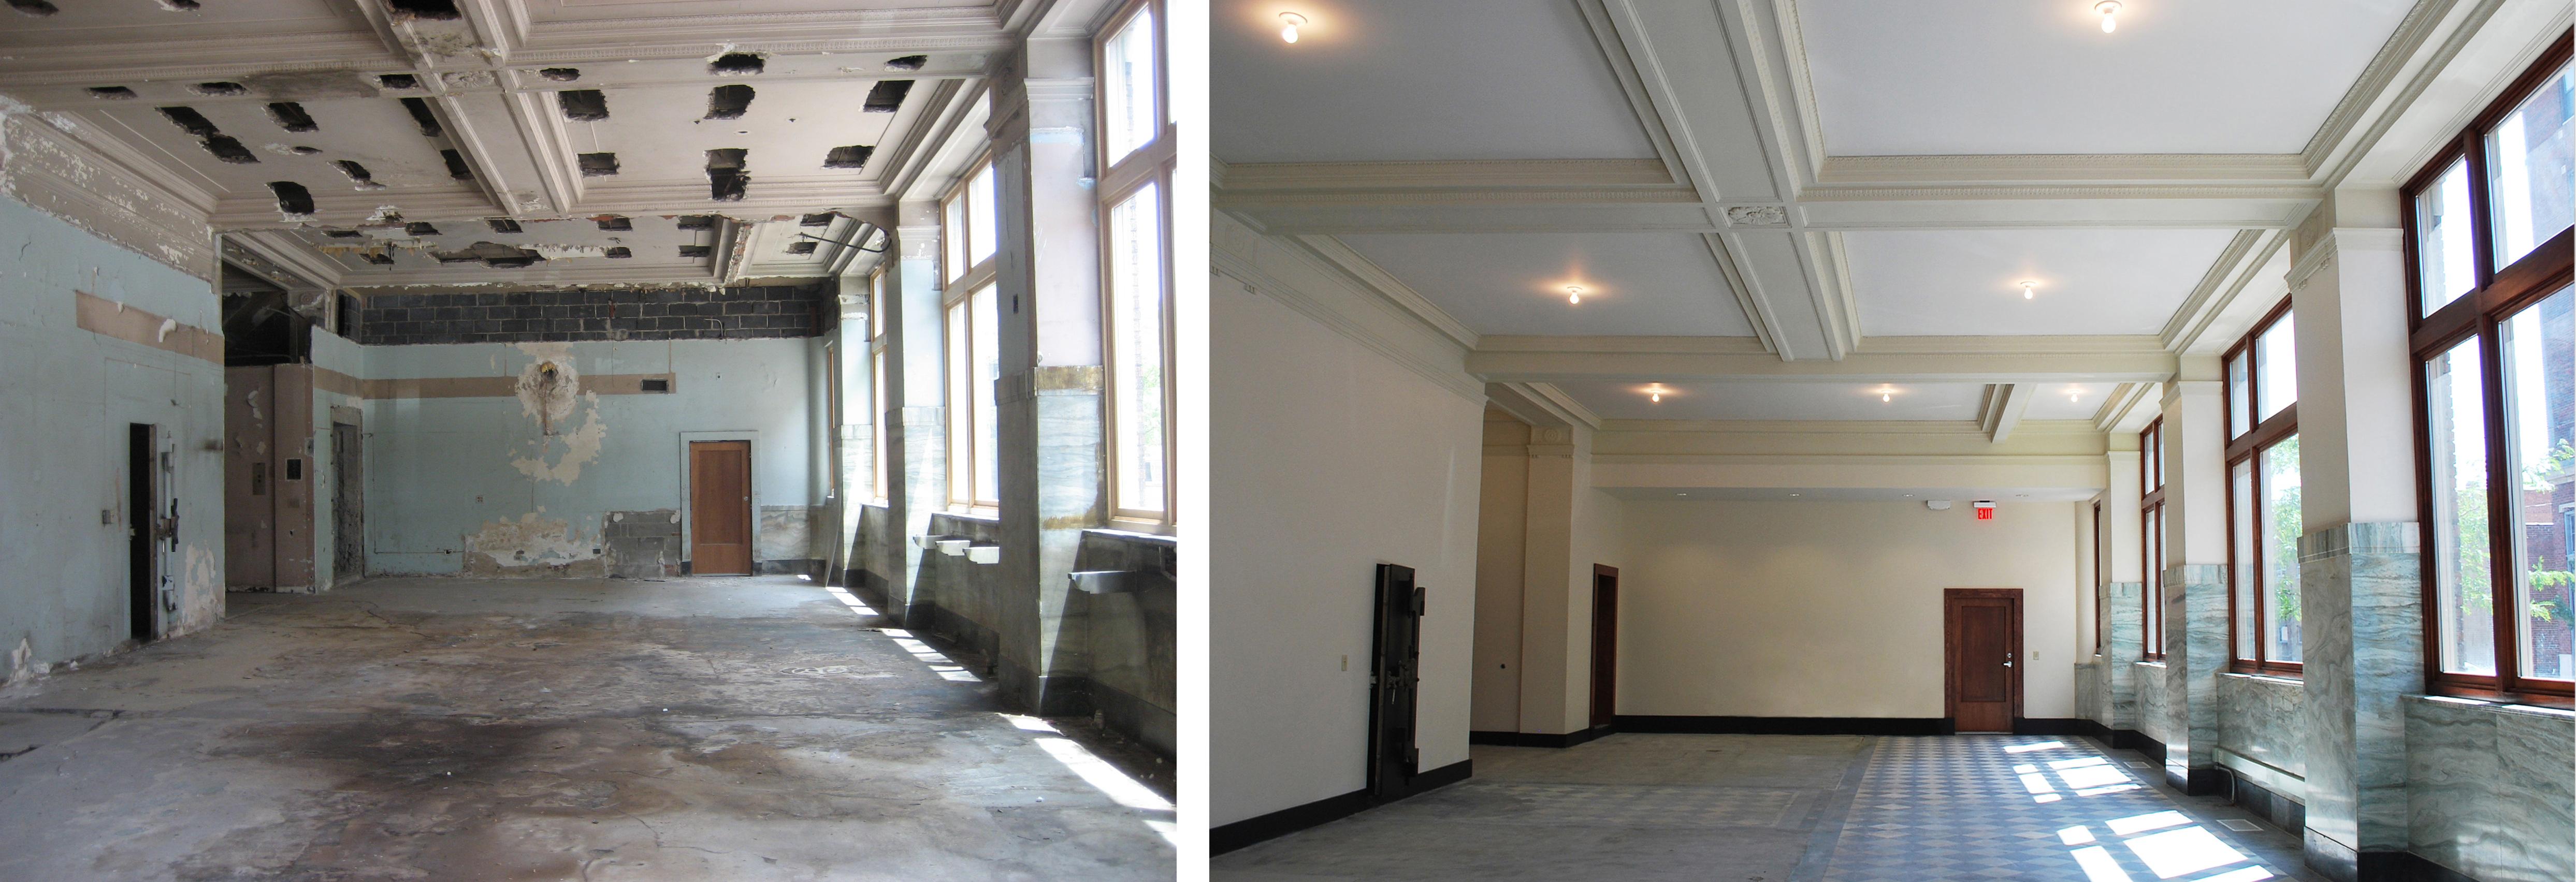 drywall antes e depois porto alegre